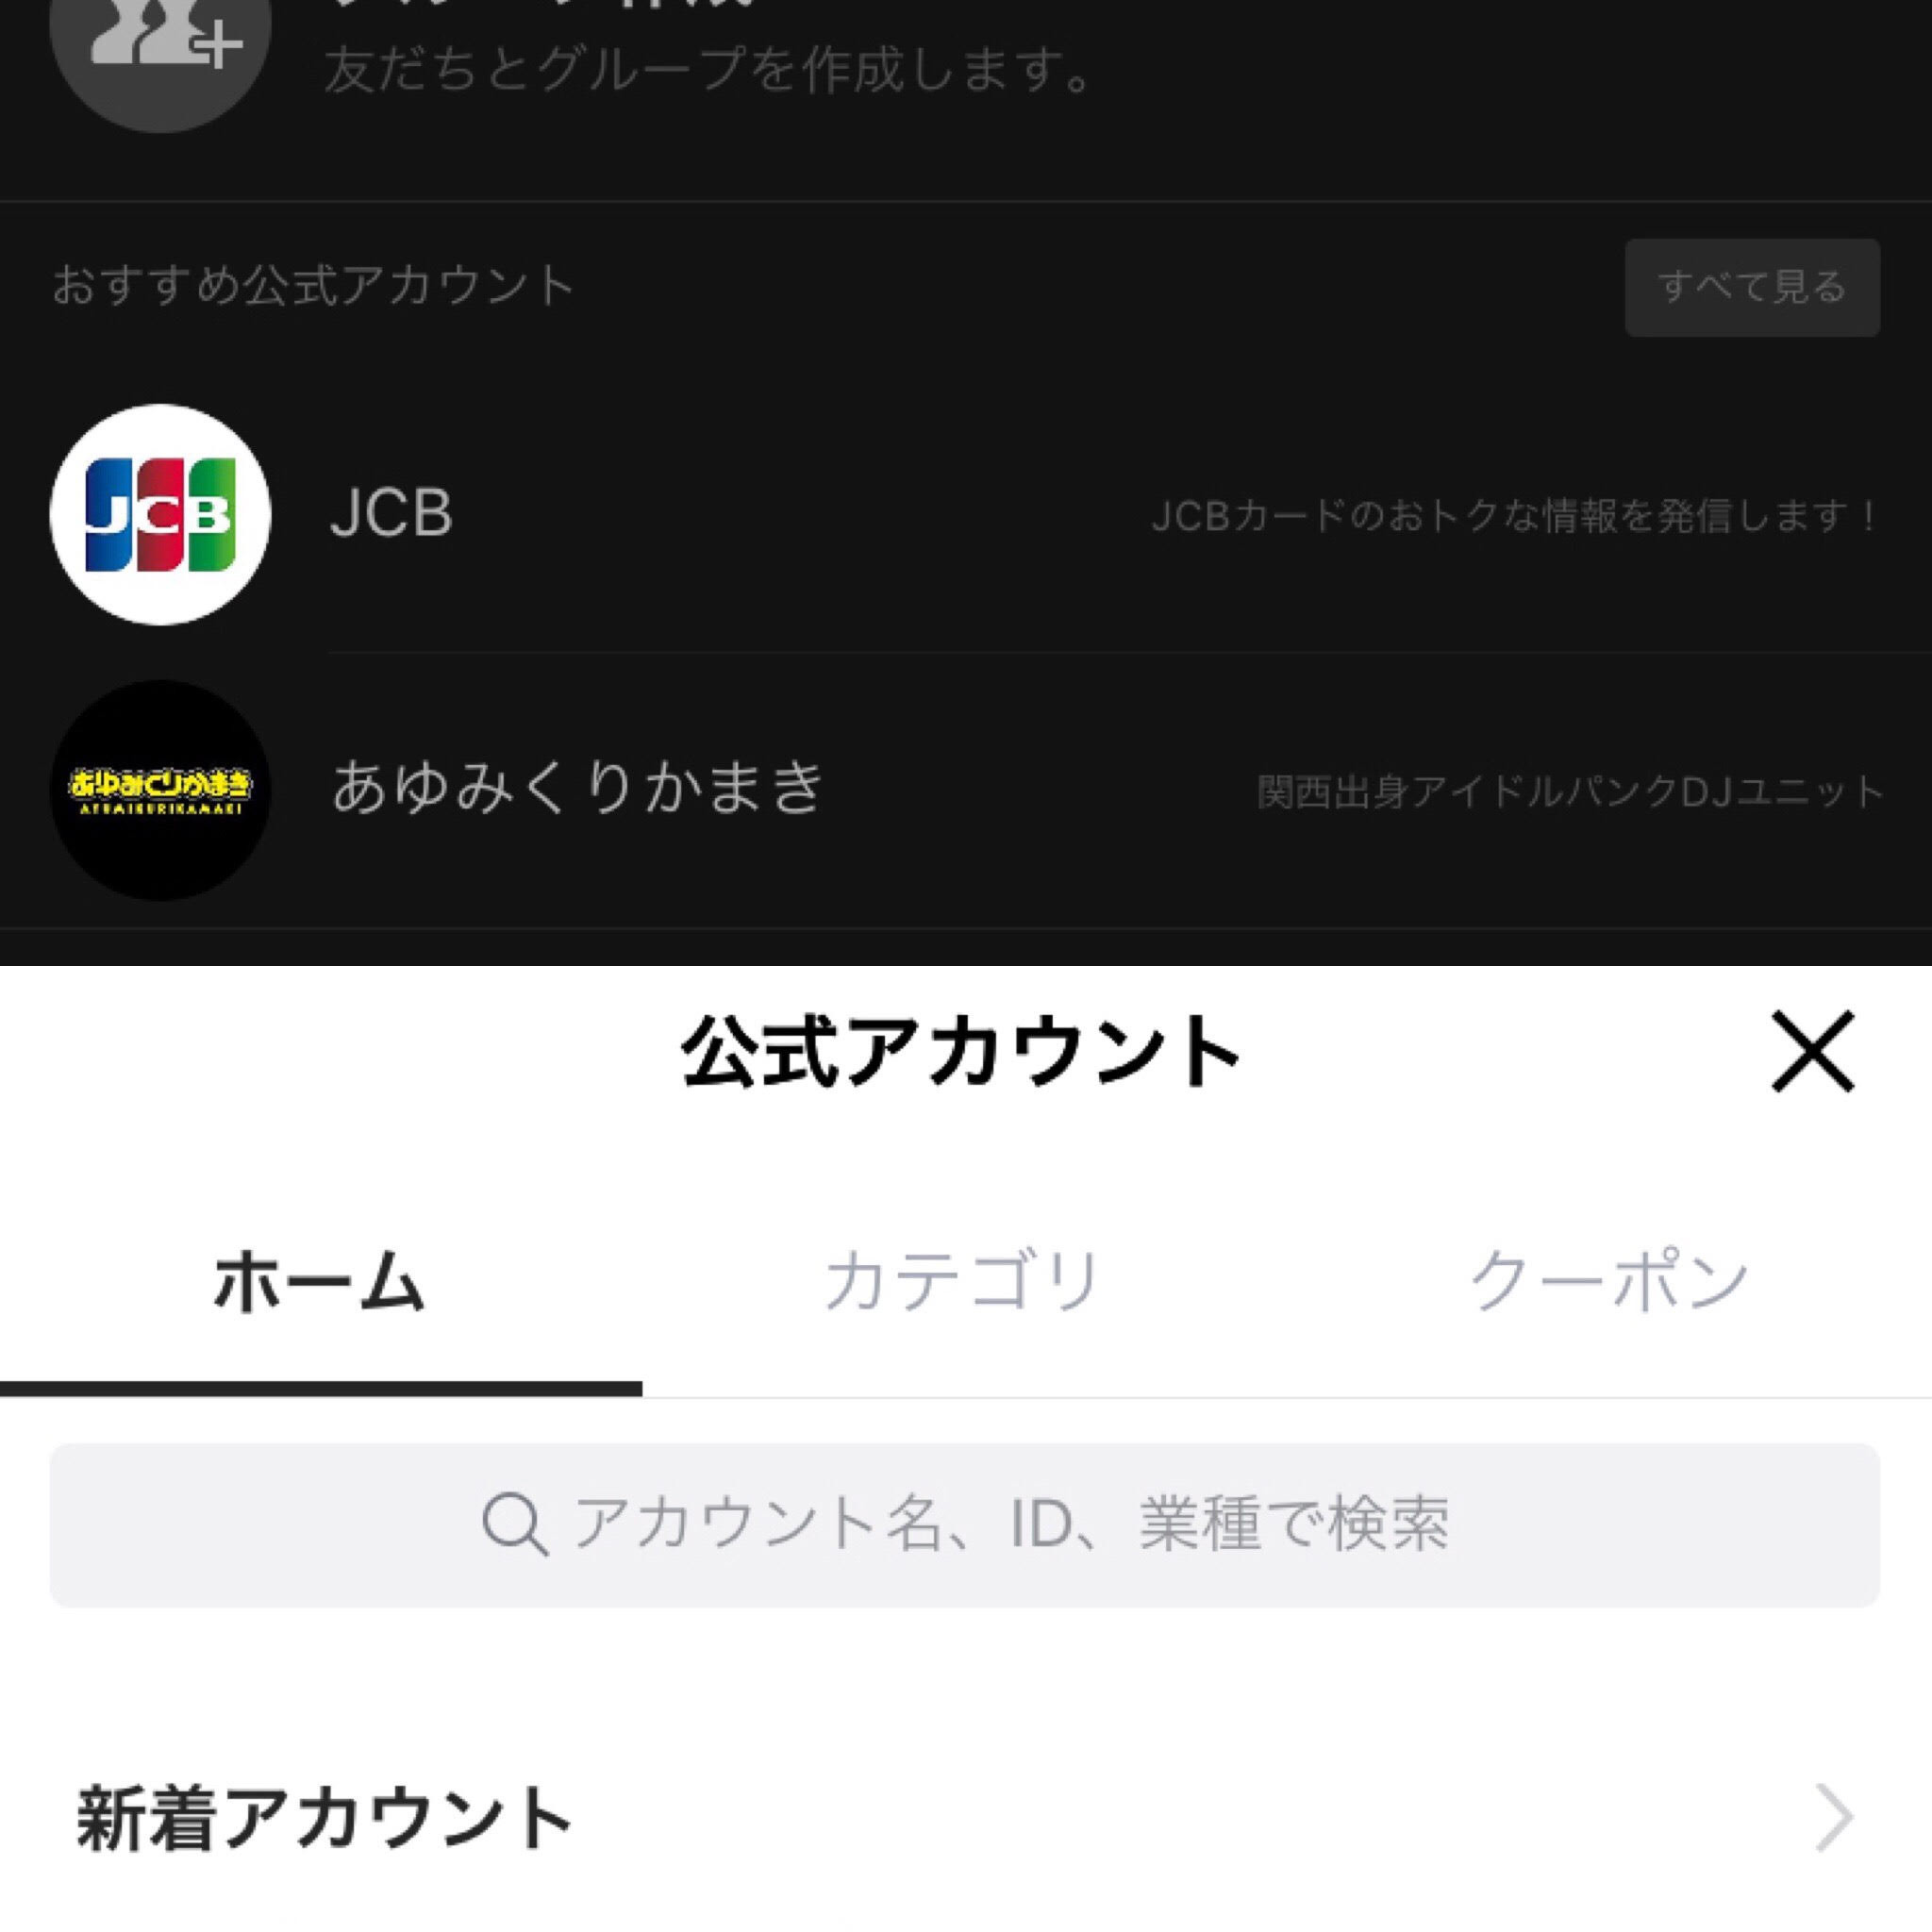 FreeStyle 通信- vol.0 -